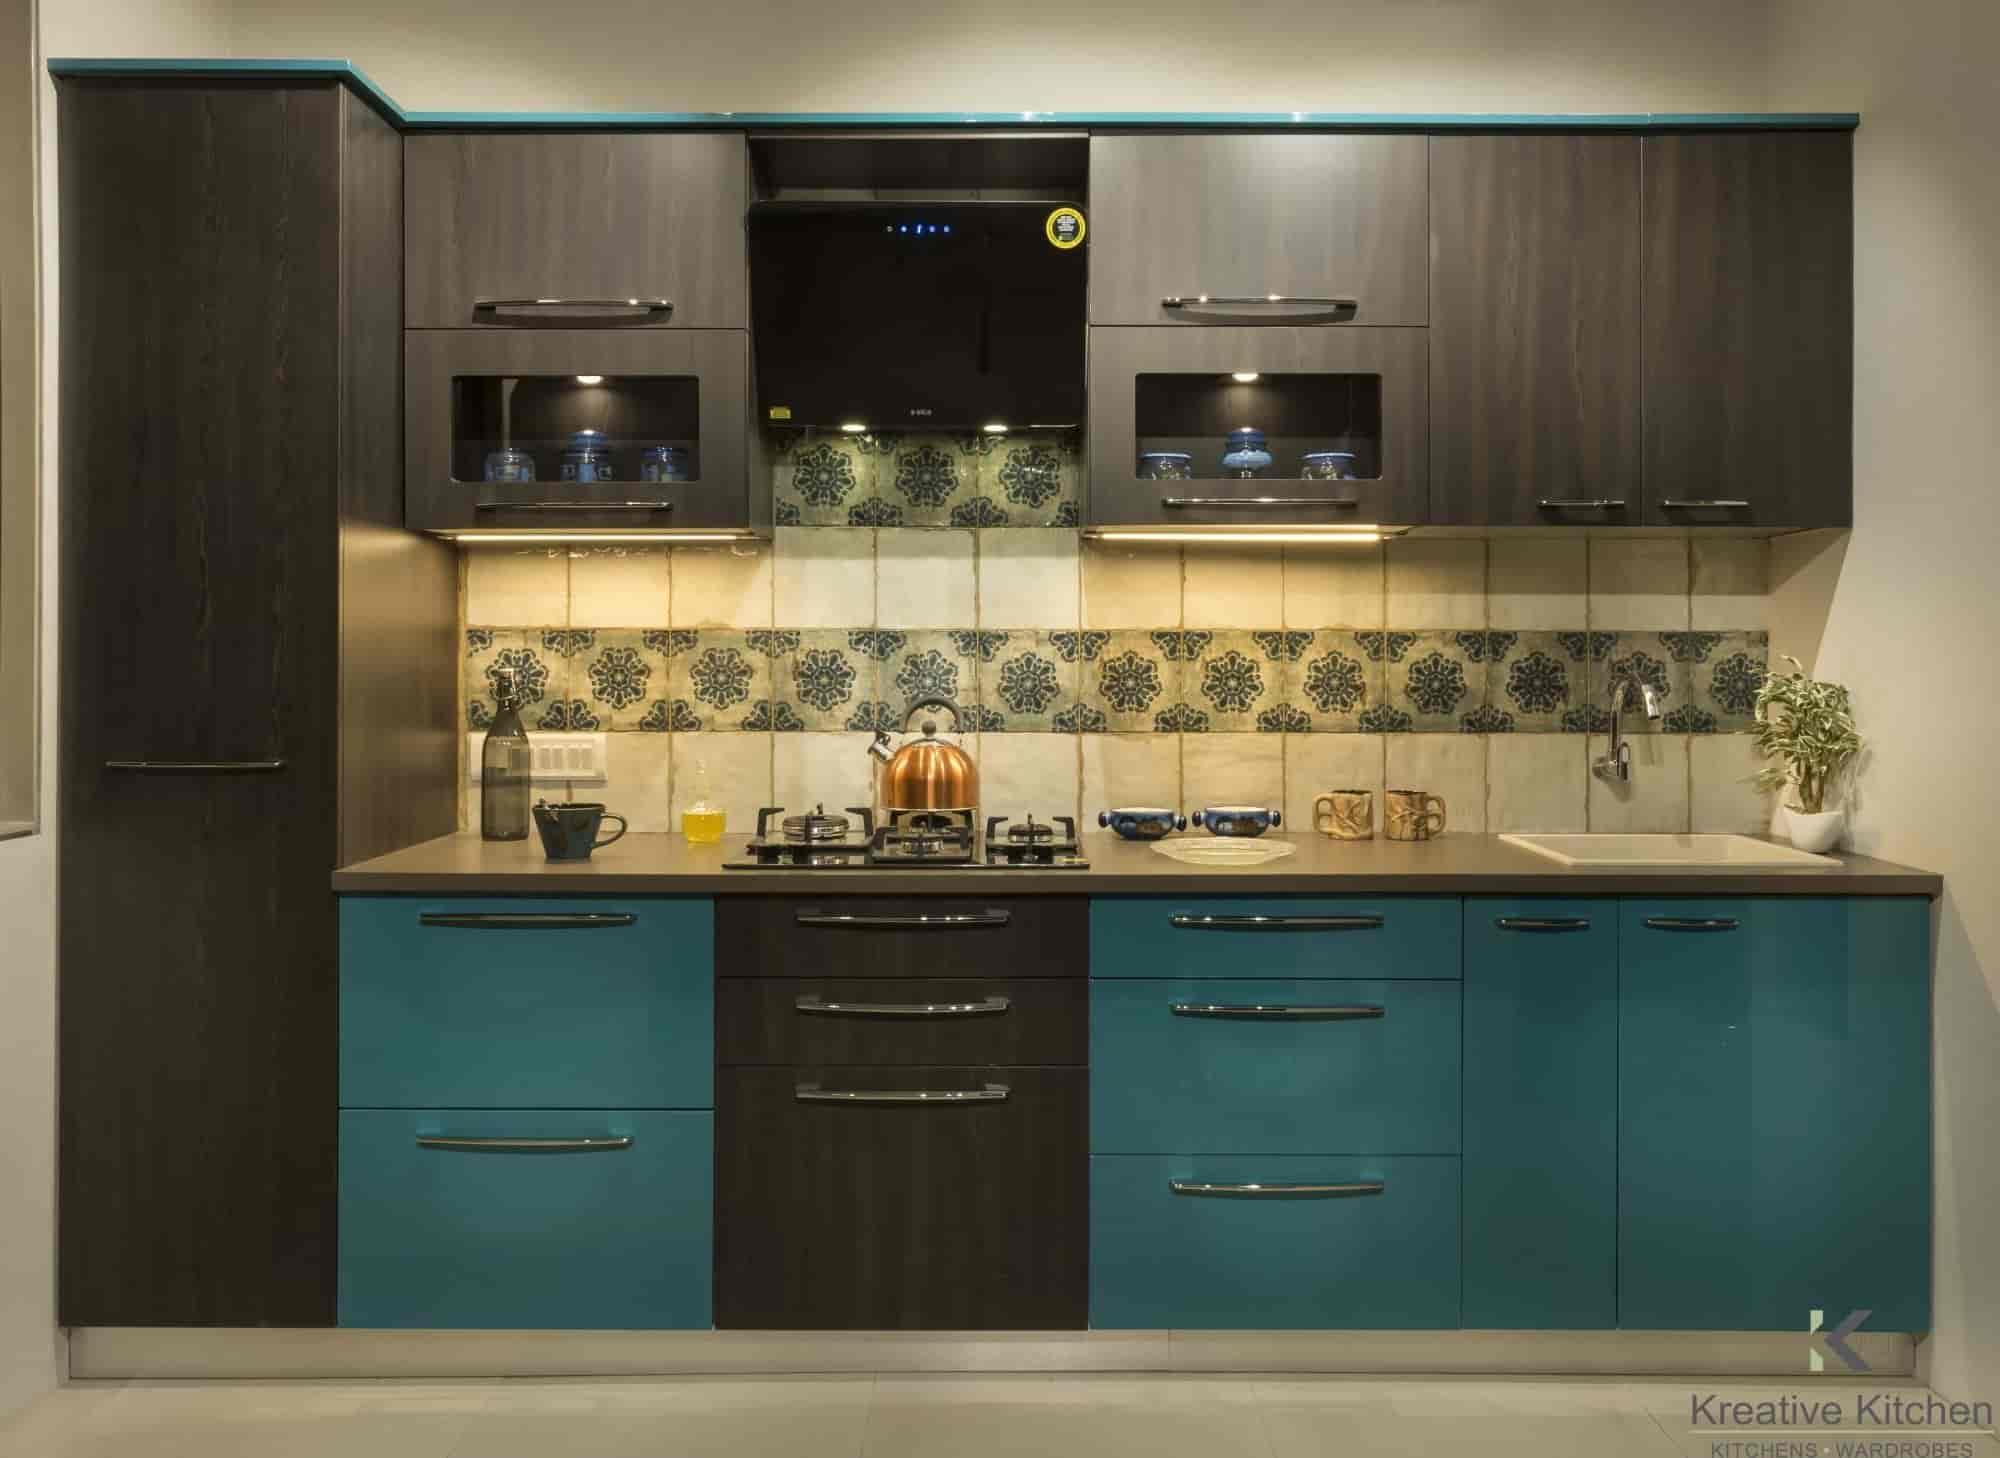 Kreative Kitchen Photos, Thane West, Mumbai  Pictures & Images ...